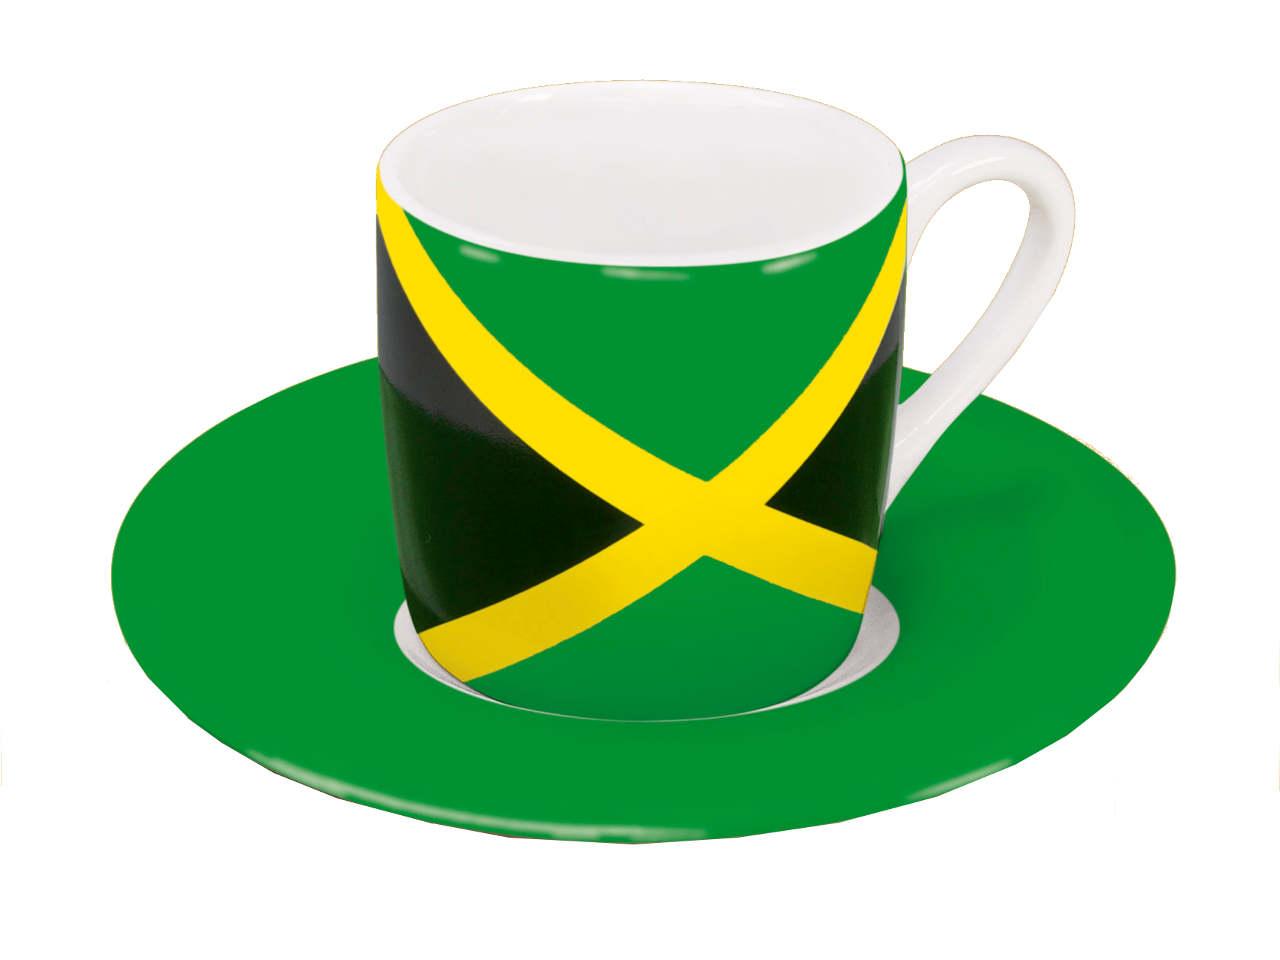 Motiv Jamaikaflagge auf Espressotasse mit Untertasse